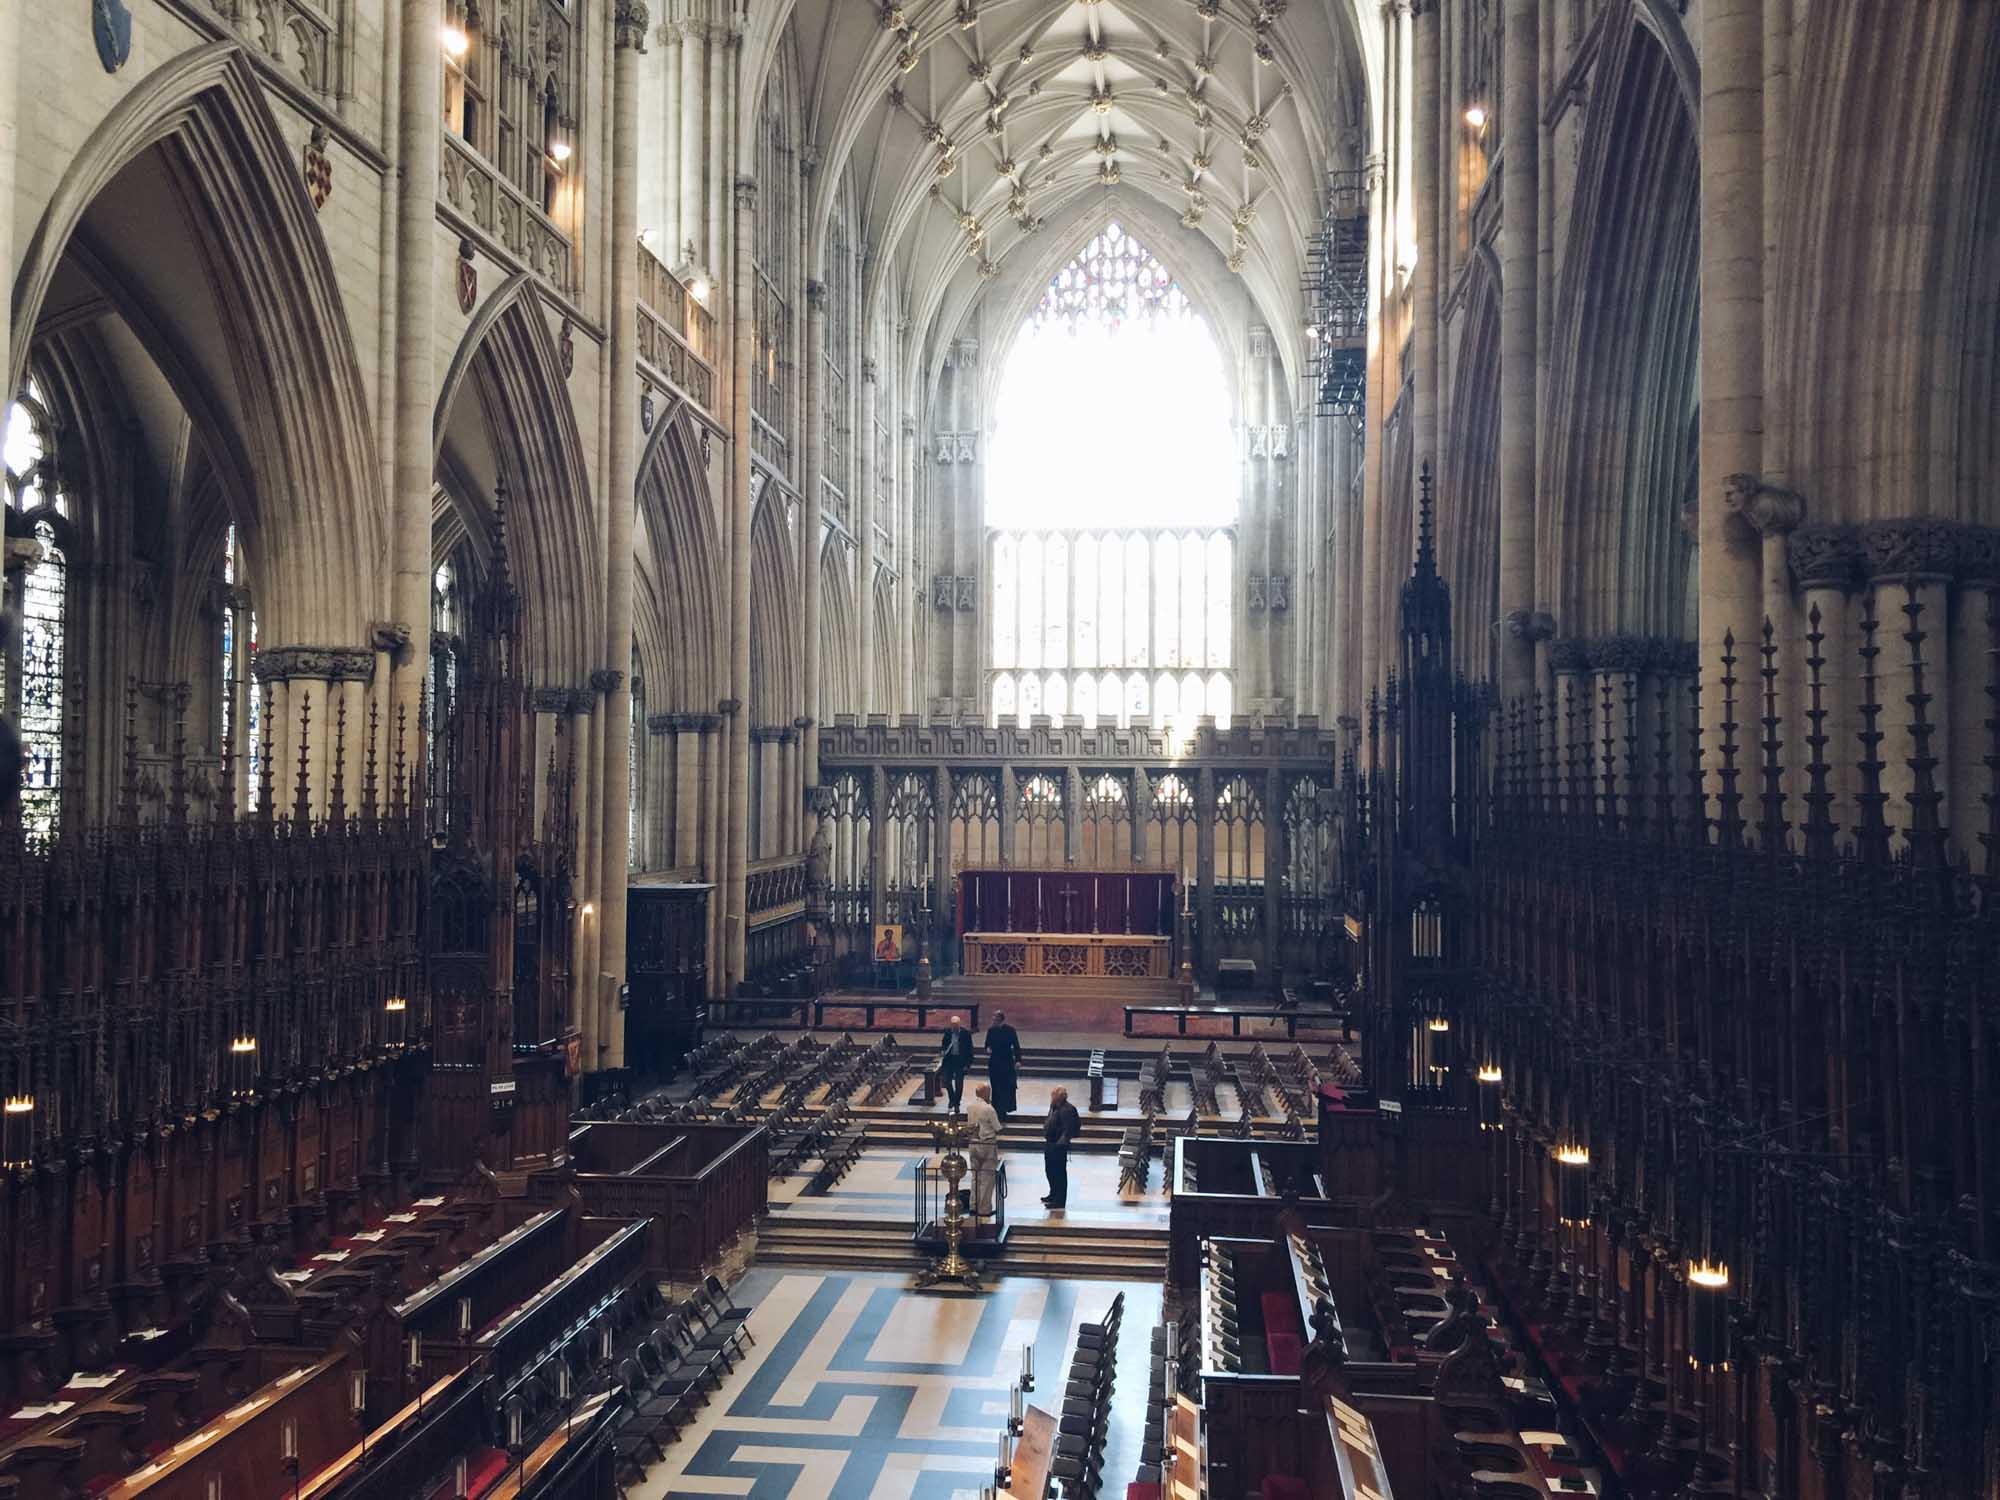 Best things to do in York - York Minster